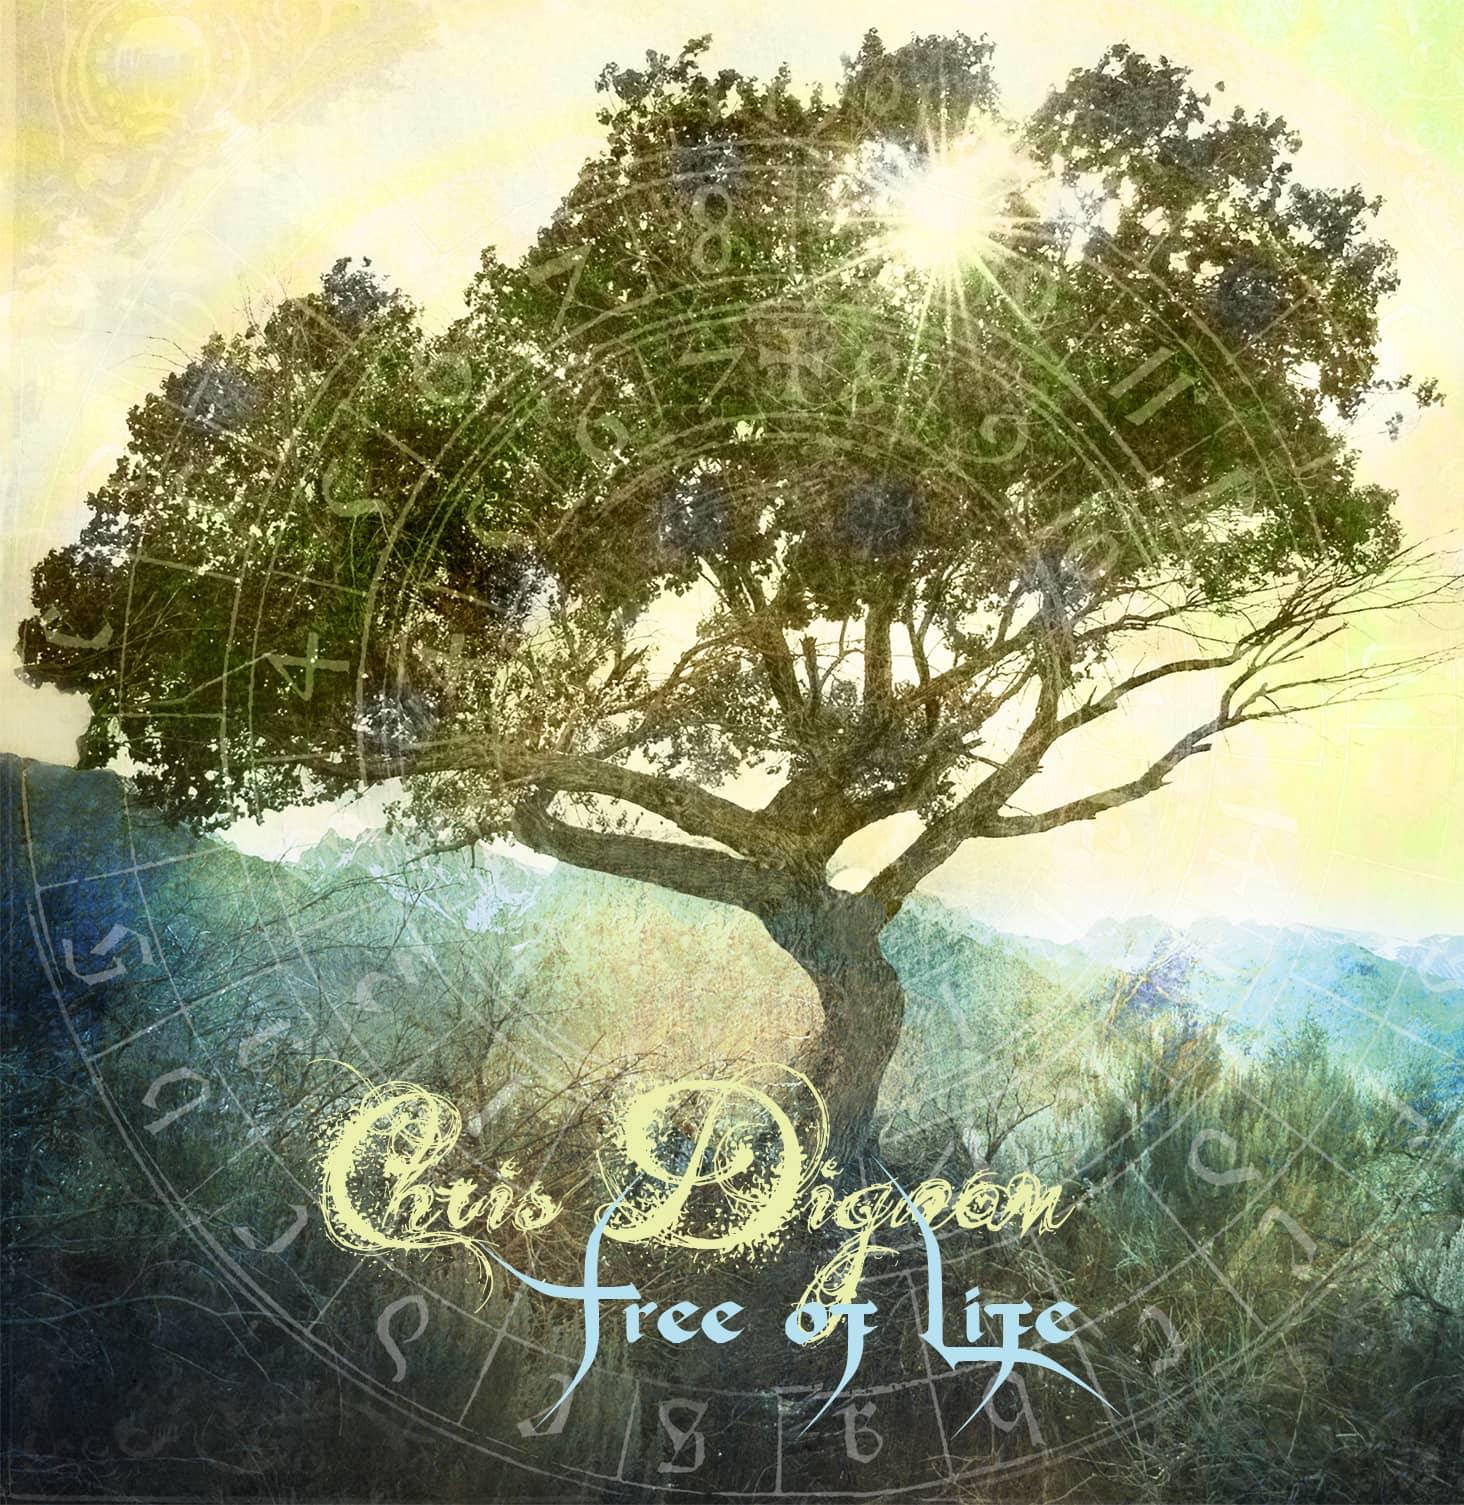 Tree of Life Cover - Chris Dignam